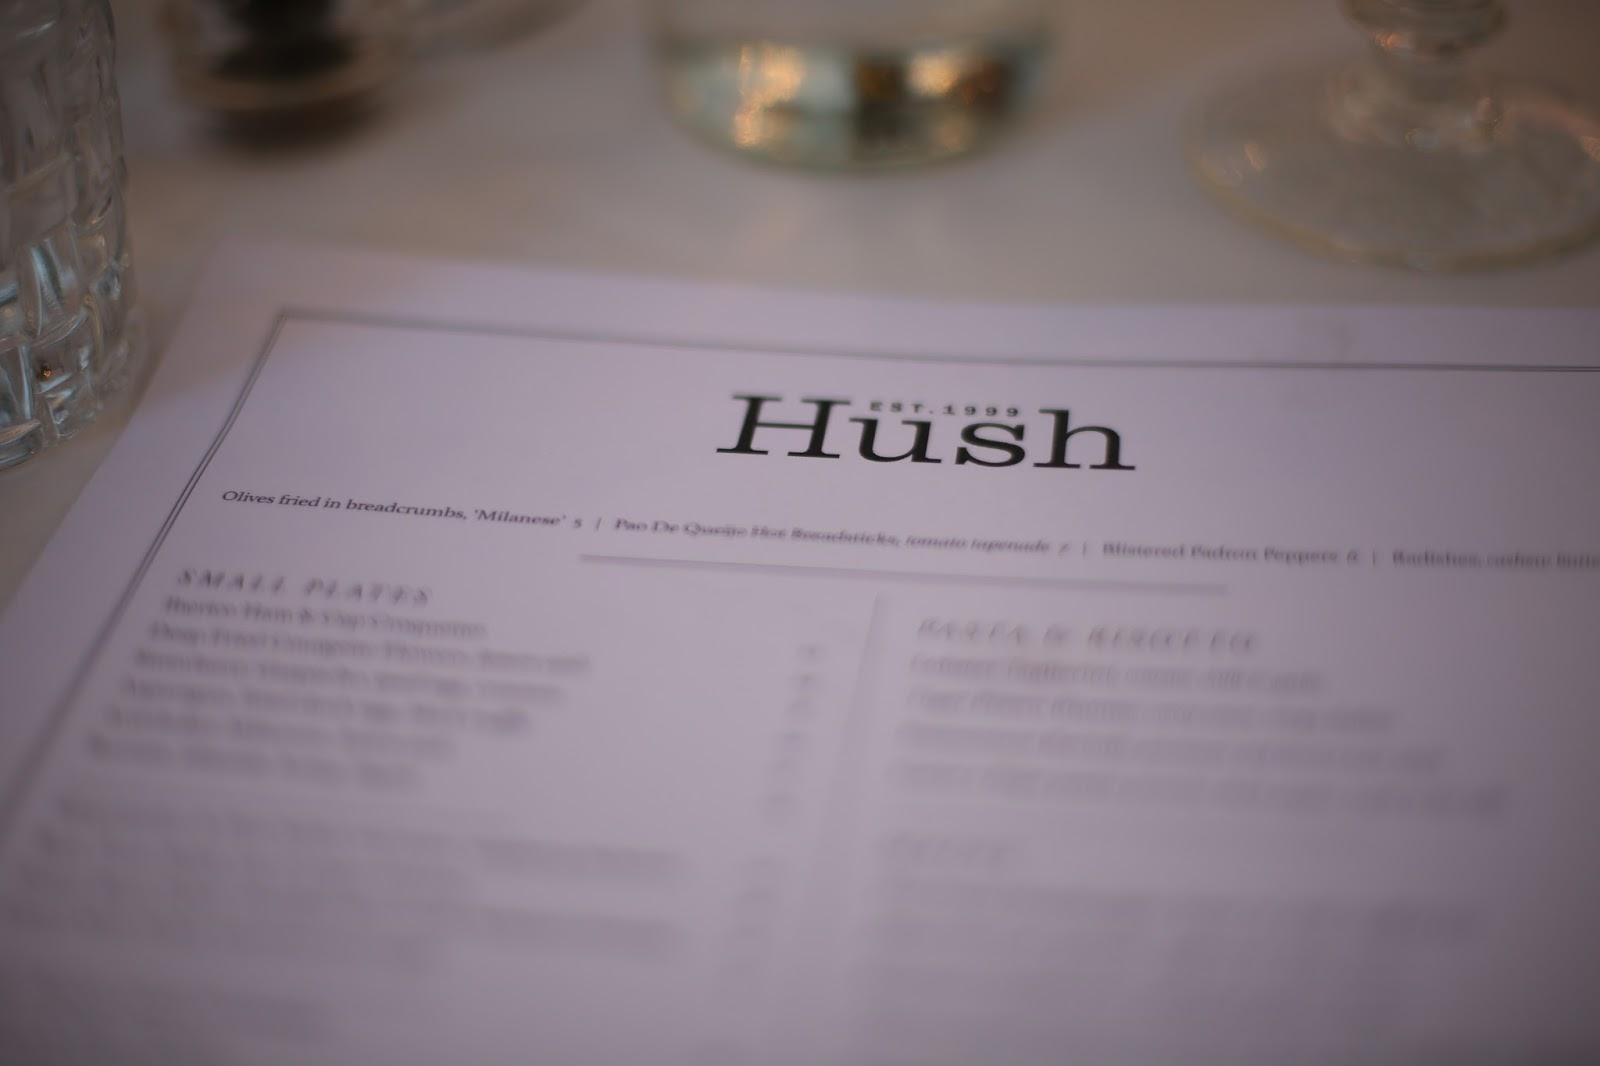 hush mayfair